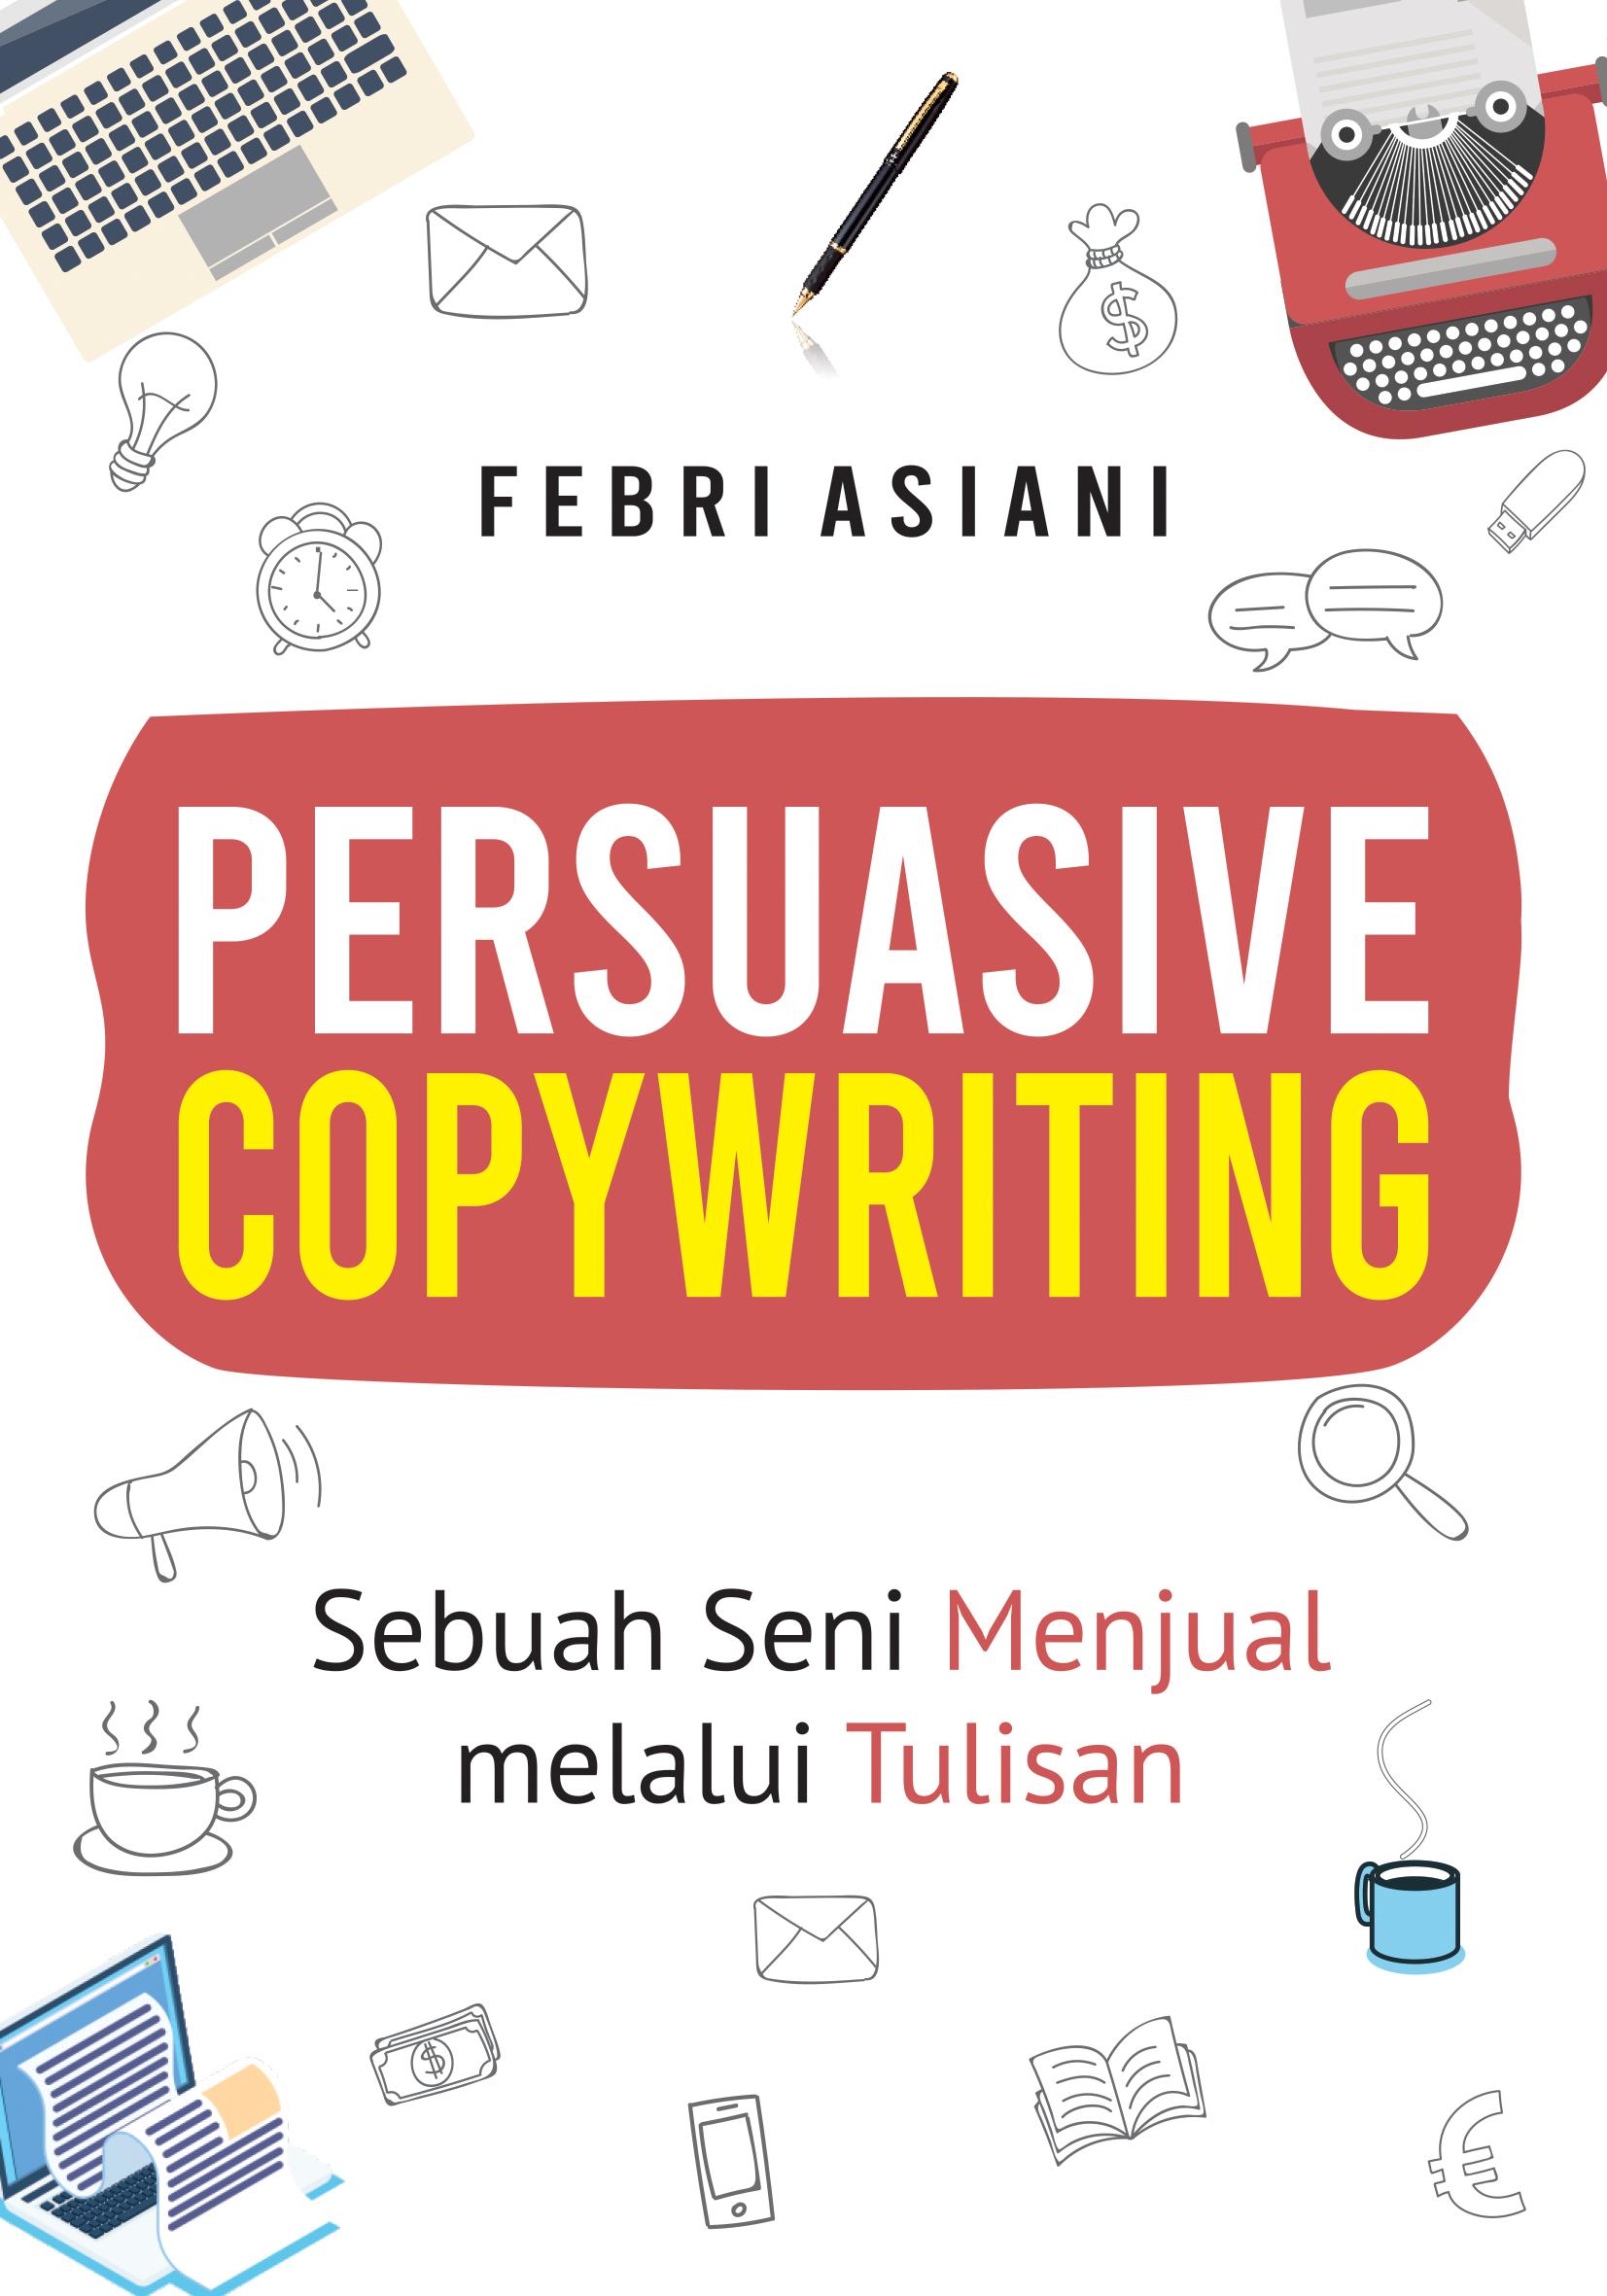 Persuasive copywriting [sumber elektronis] : sebuah seni menjual melalui tulisan